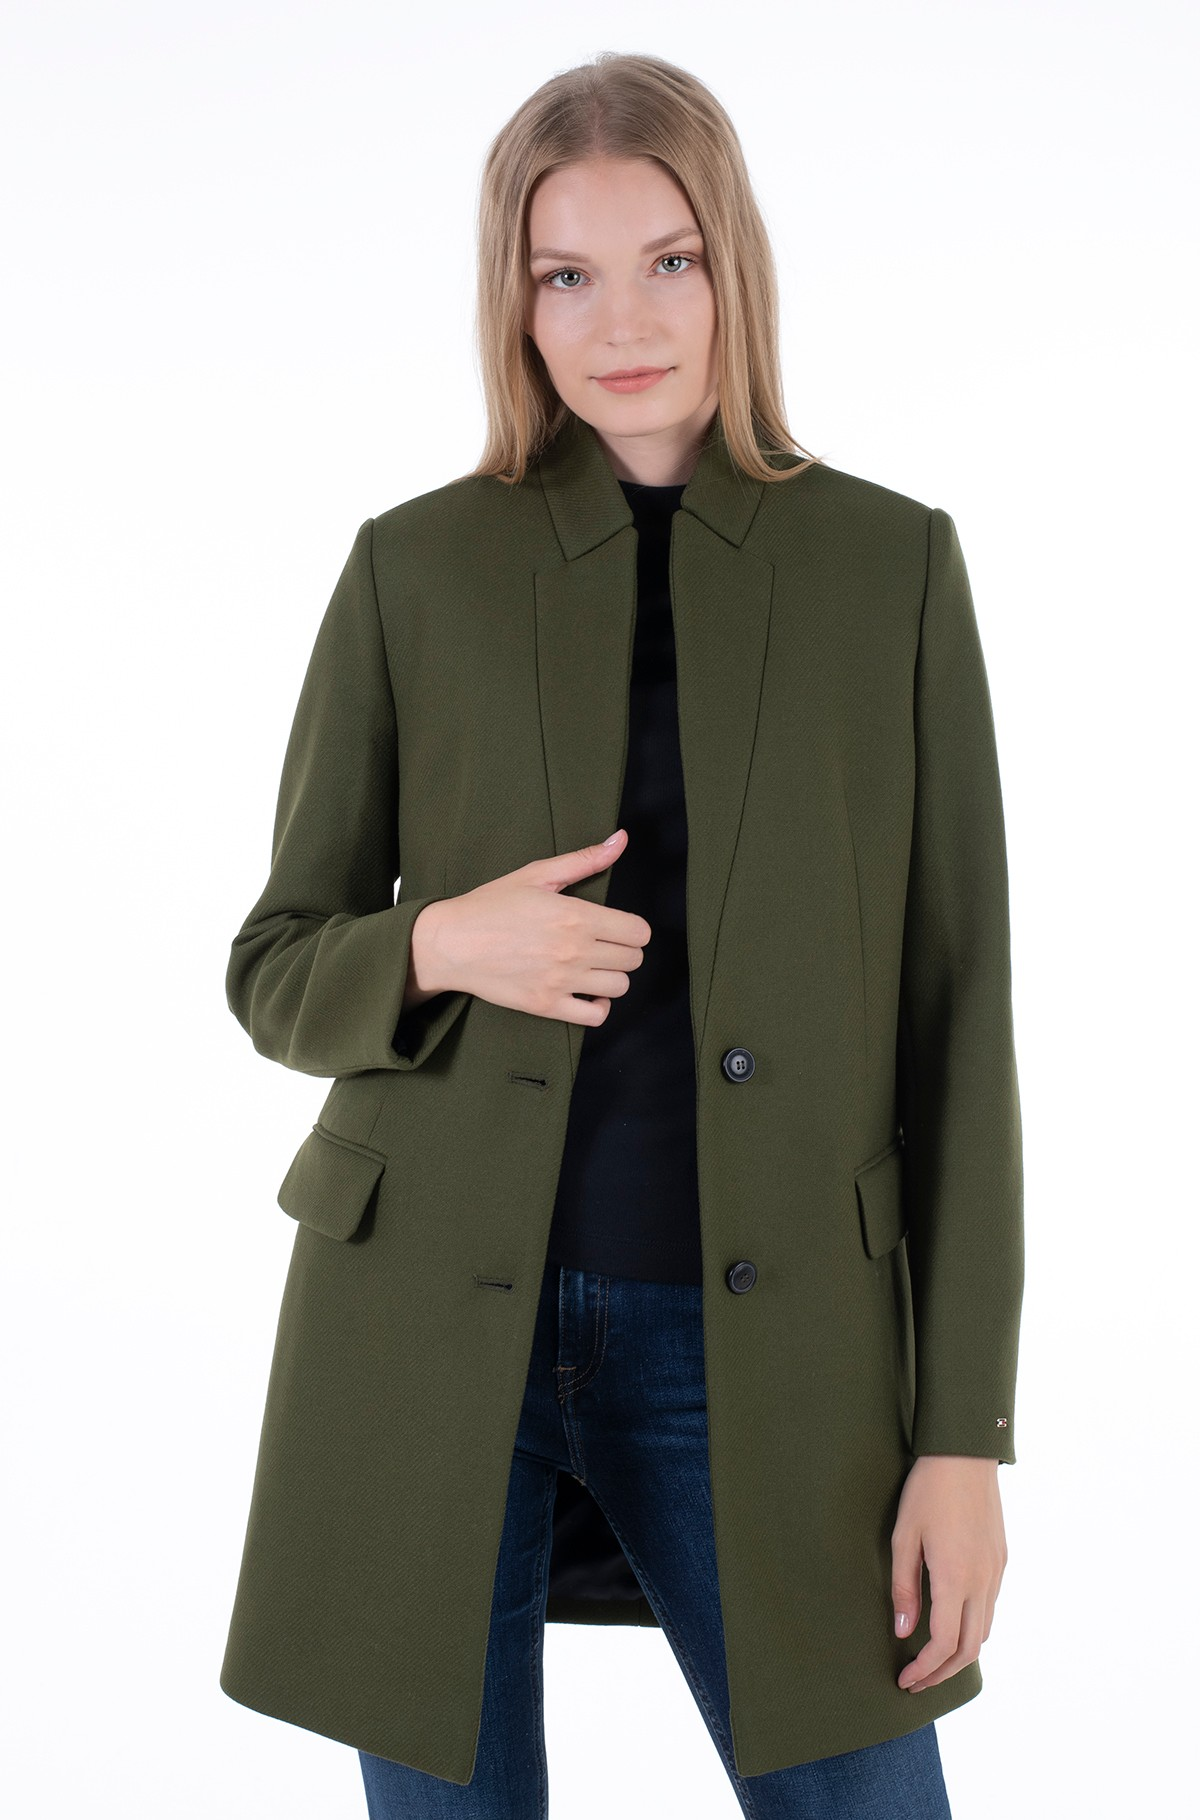 Coat WOOL BLEND SB HIP LENGTH COAT-full-1